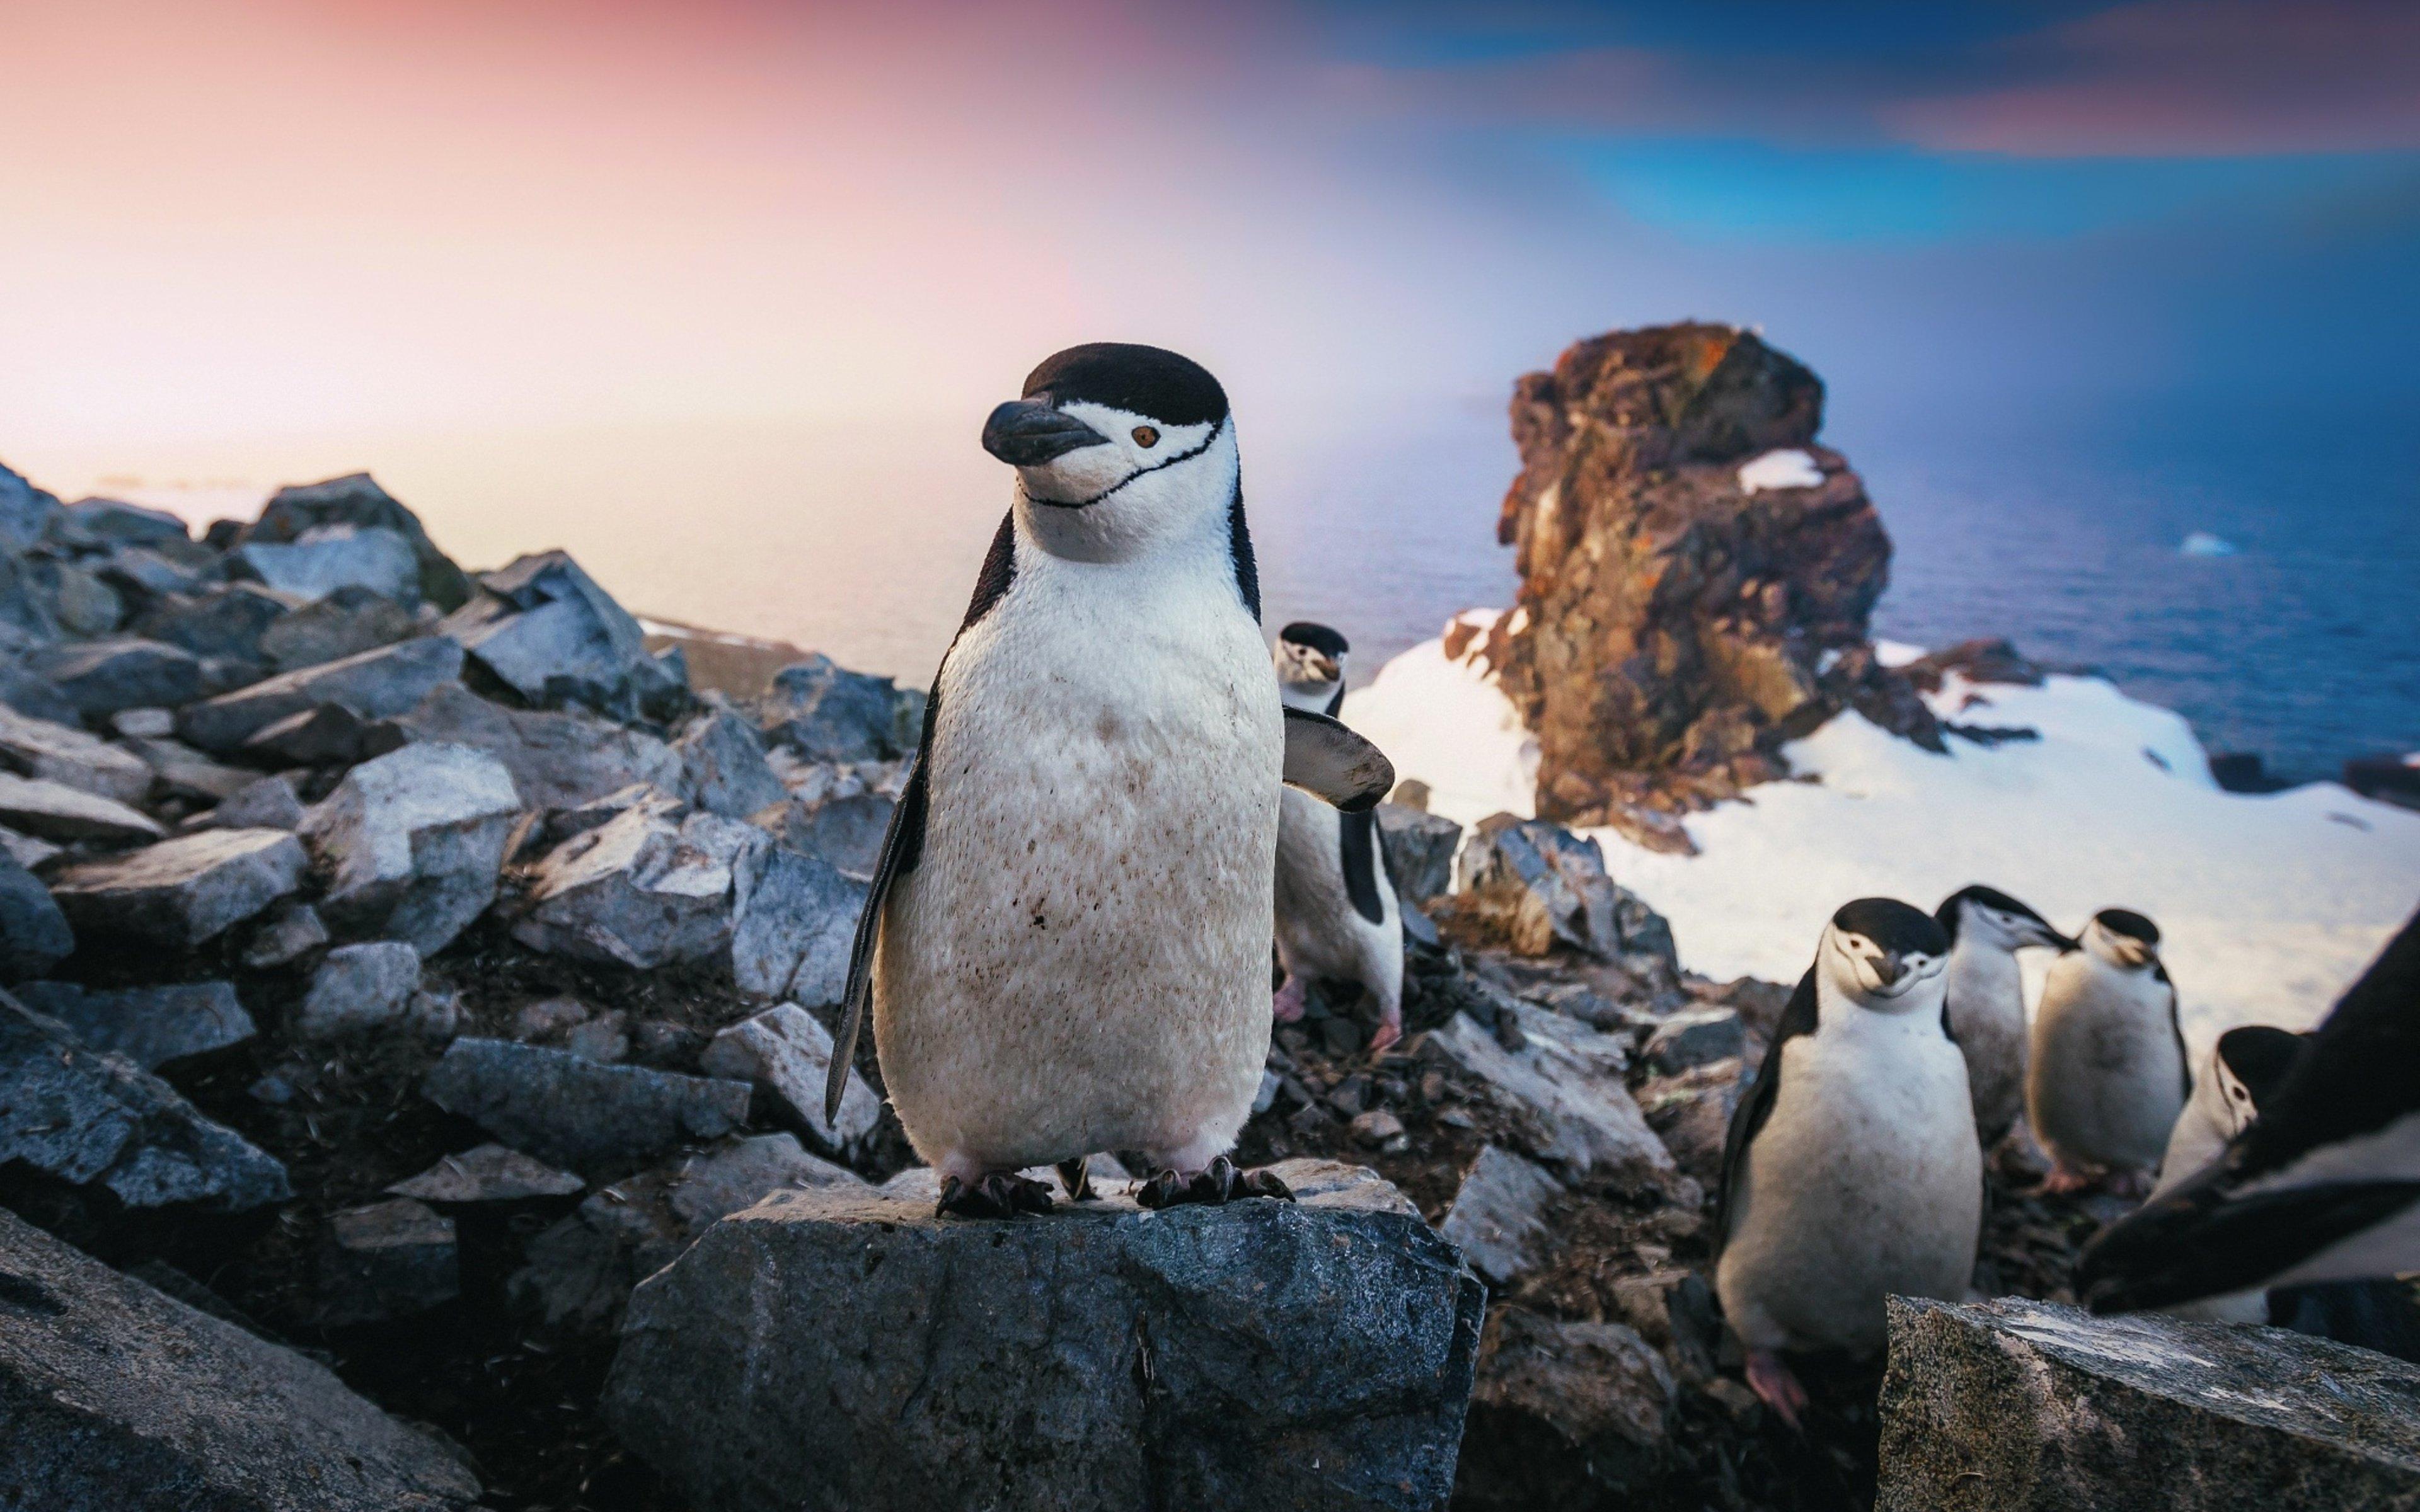 Fondos de pantalla Pingüinos al atardecer